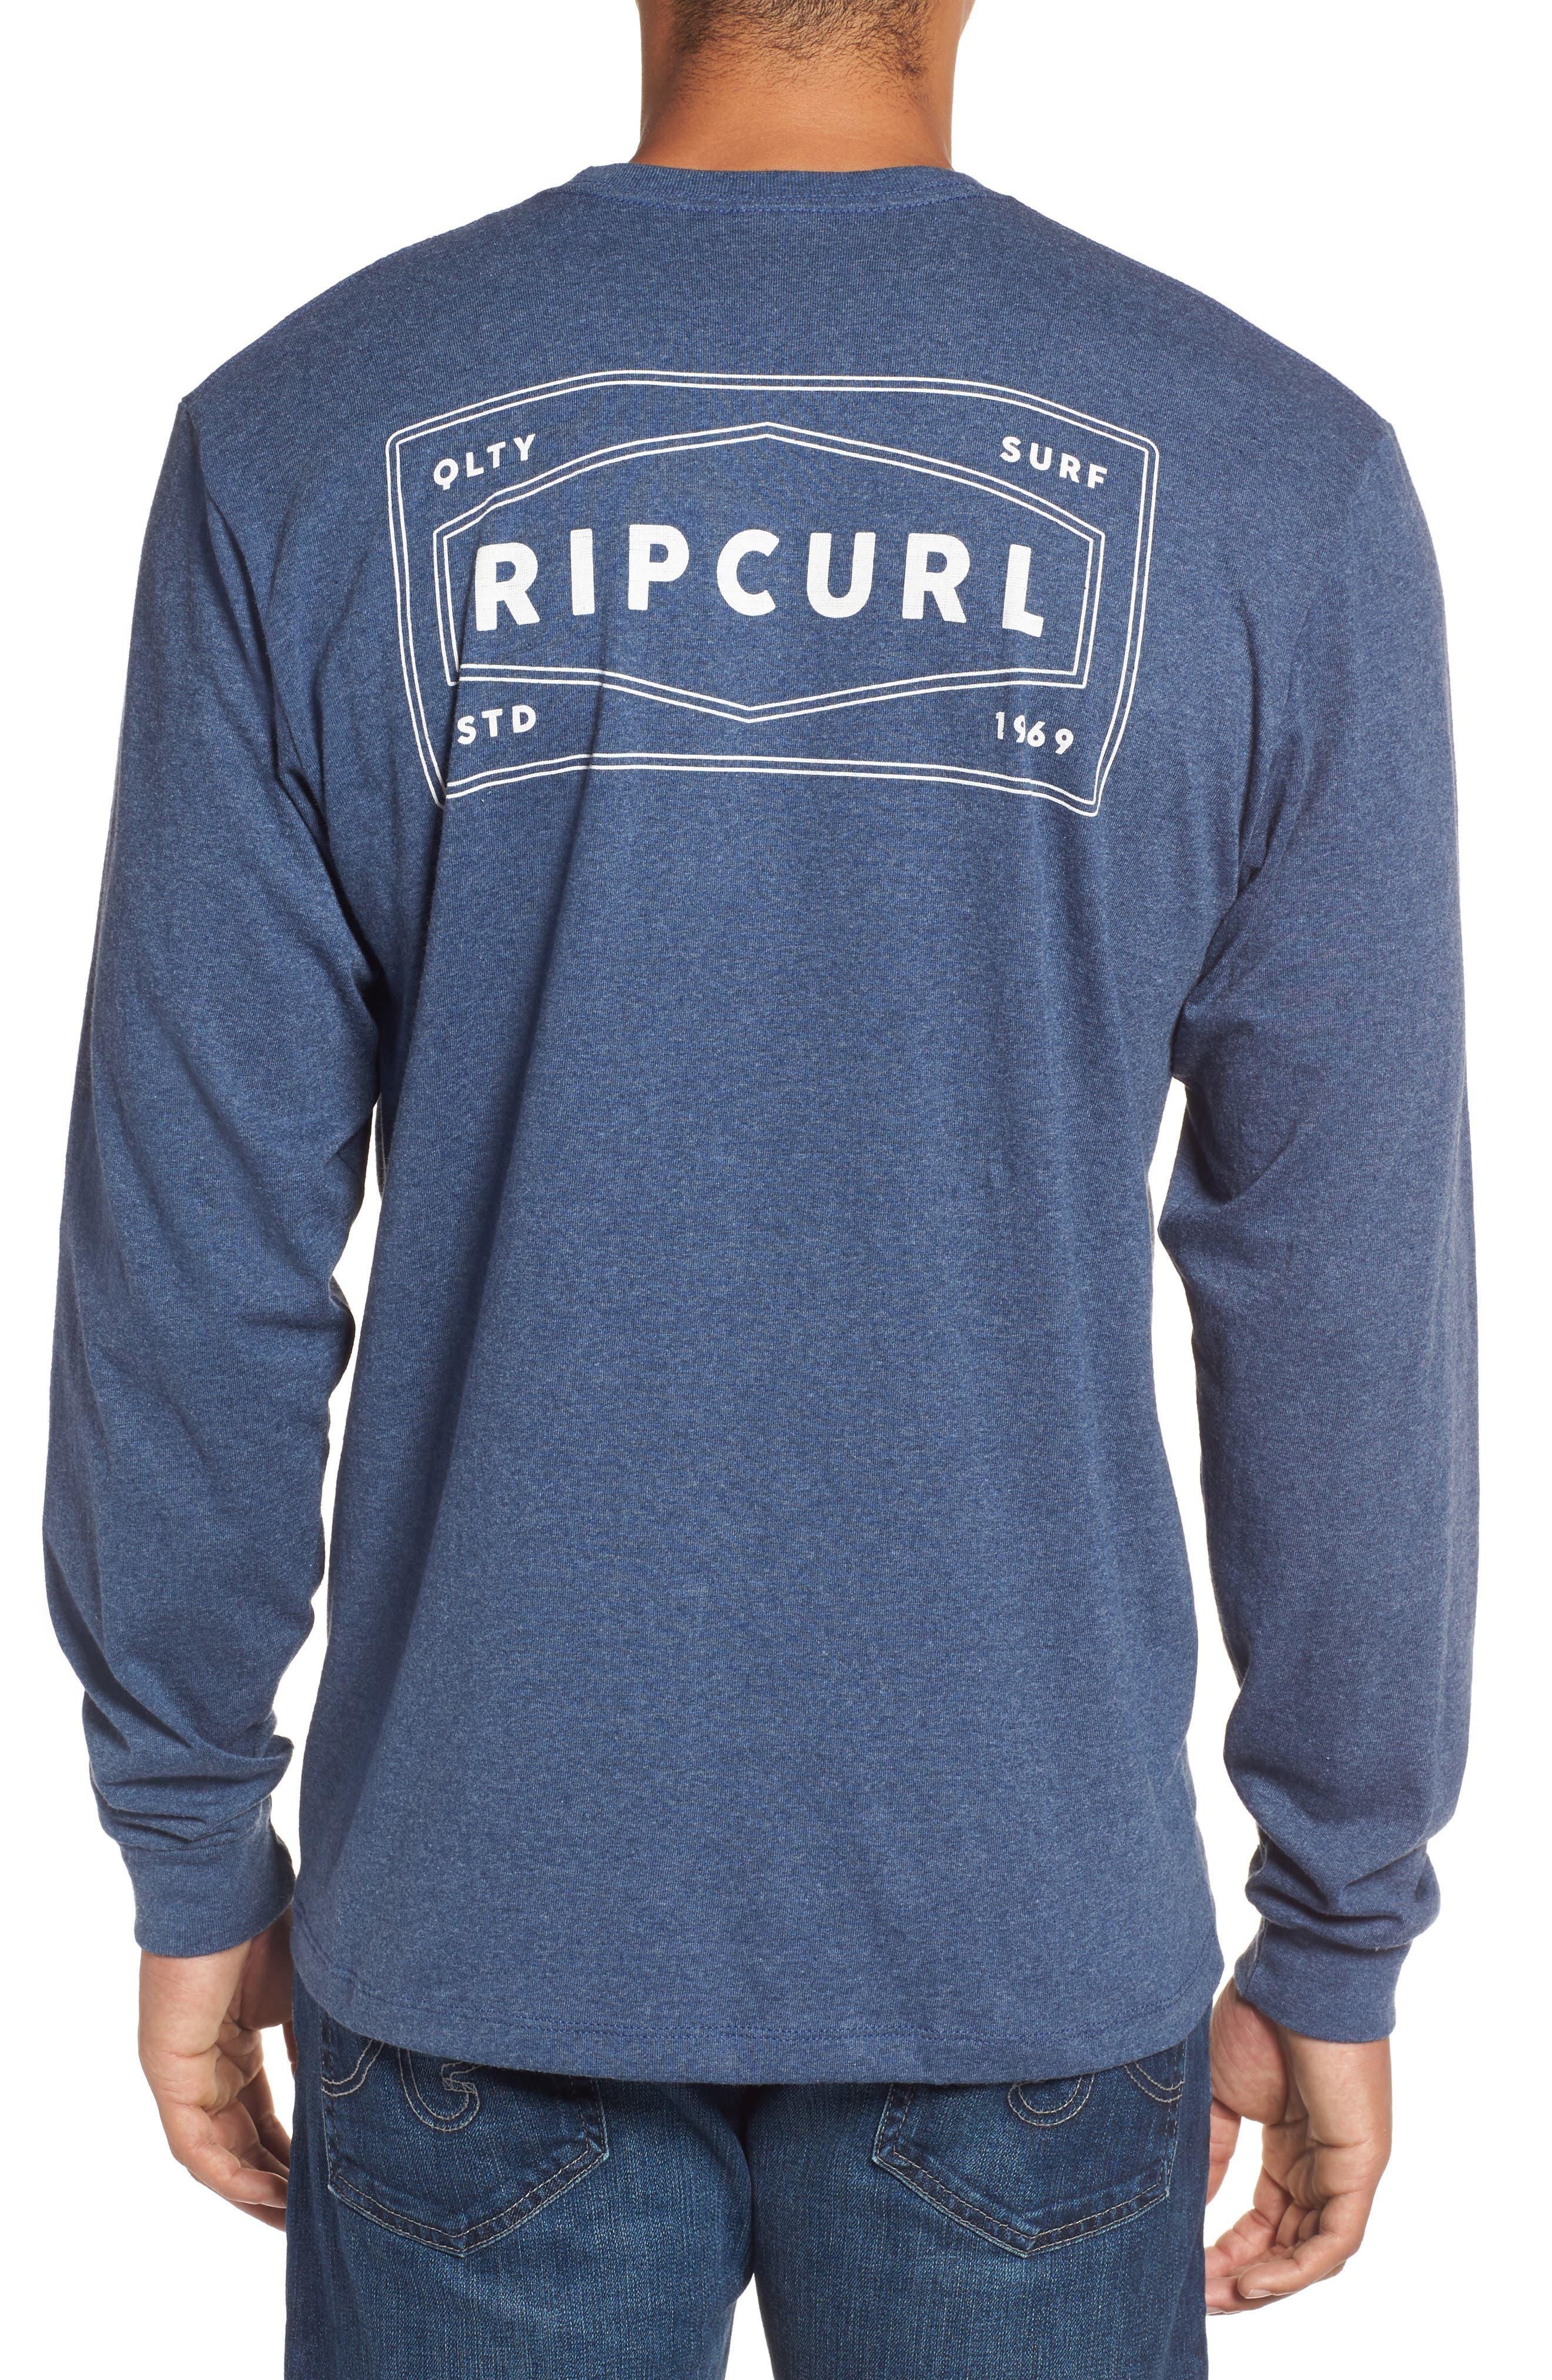 Down South Custom Graphic T-Shirt,                             Alternate thumbnail 2, color,                             410